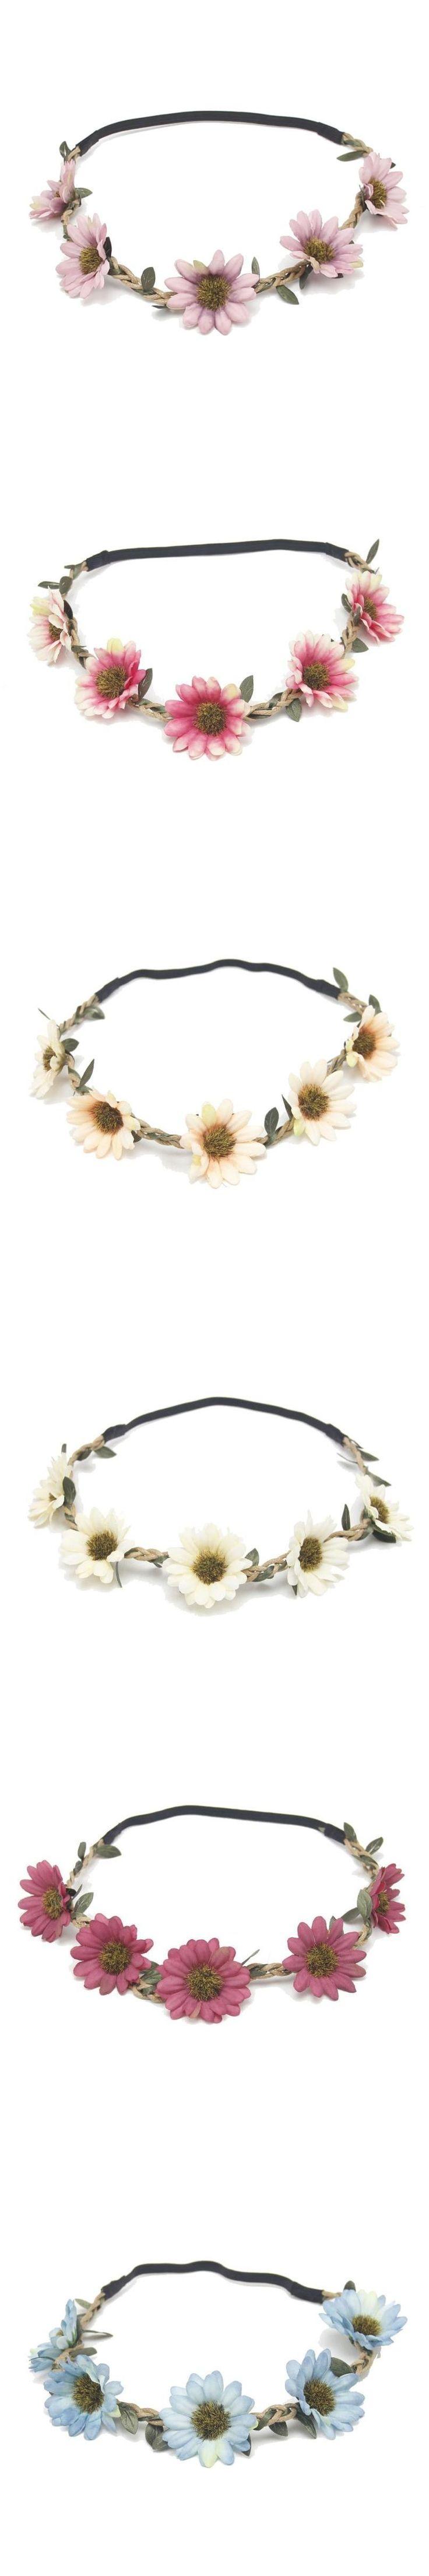 Women Boho Sunflower Garland Floral Crown Hairband Headband Beach Party Wedding Nov 8 #weddingcrowns